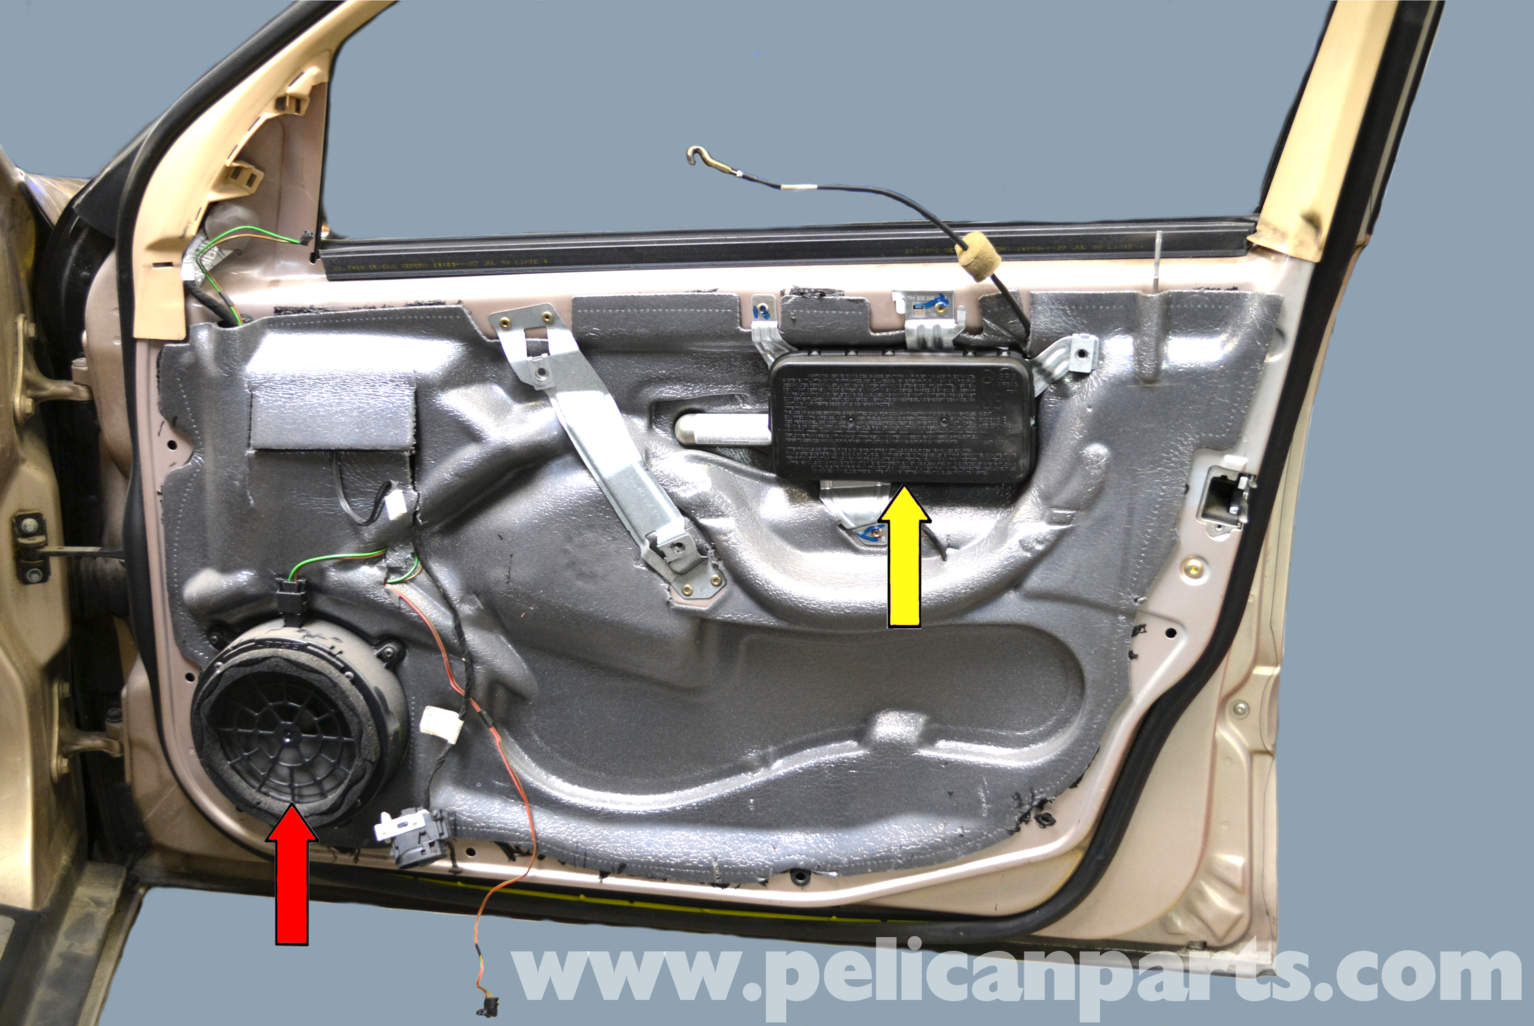 W164 Fuse F3 Ml Mercedes T Benz Ml320 2001 C280 Front Engine Box Diagram